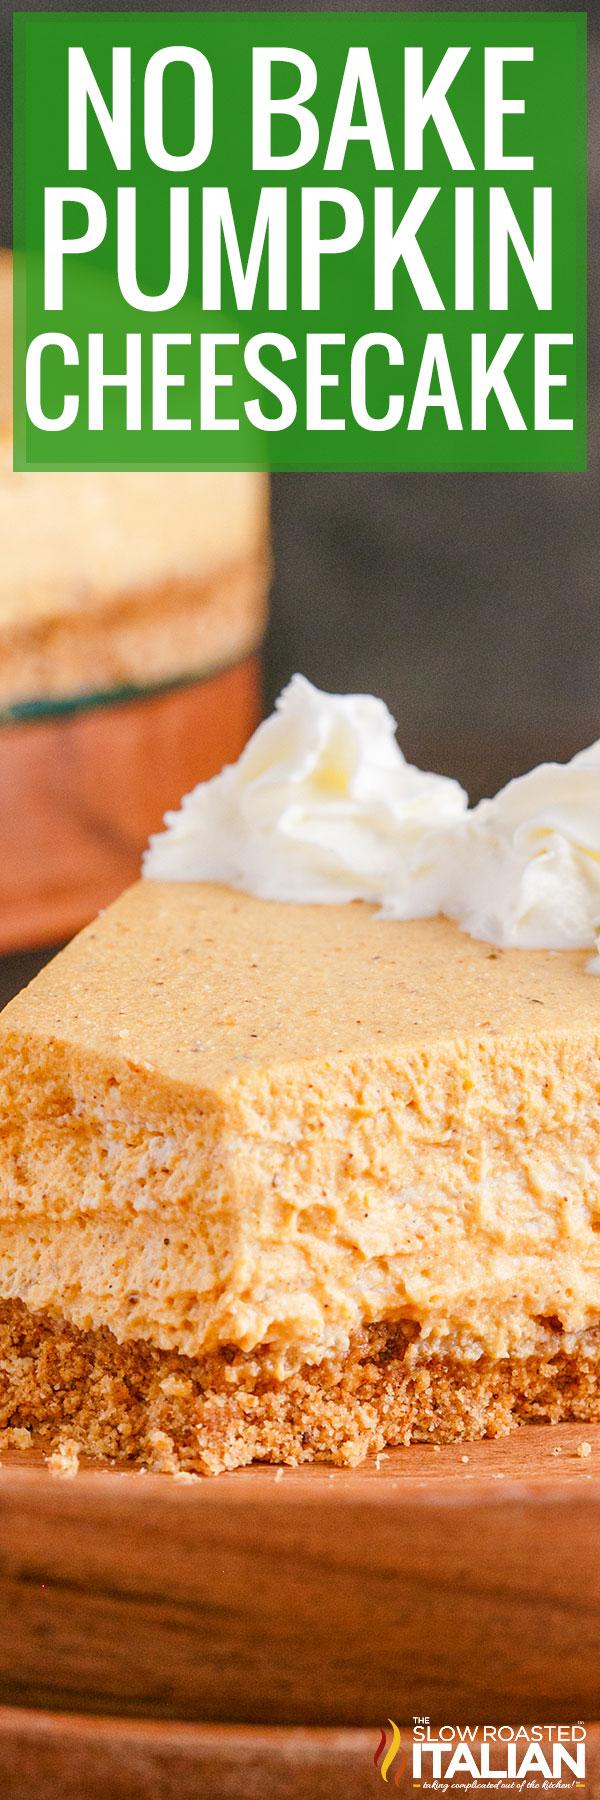 No Bake Pumpkin Cheesecake closeup